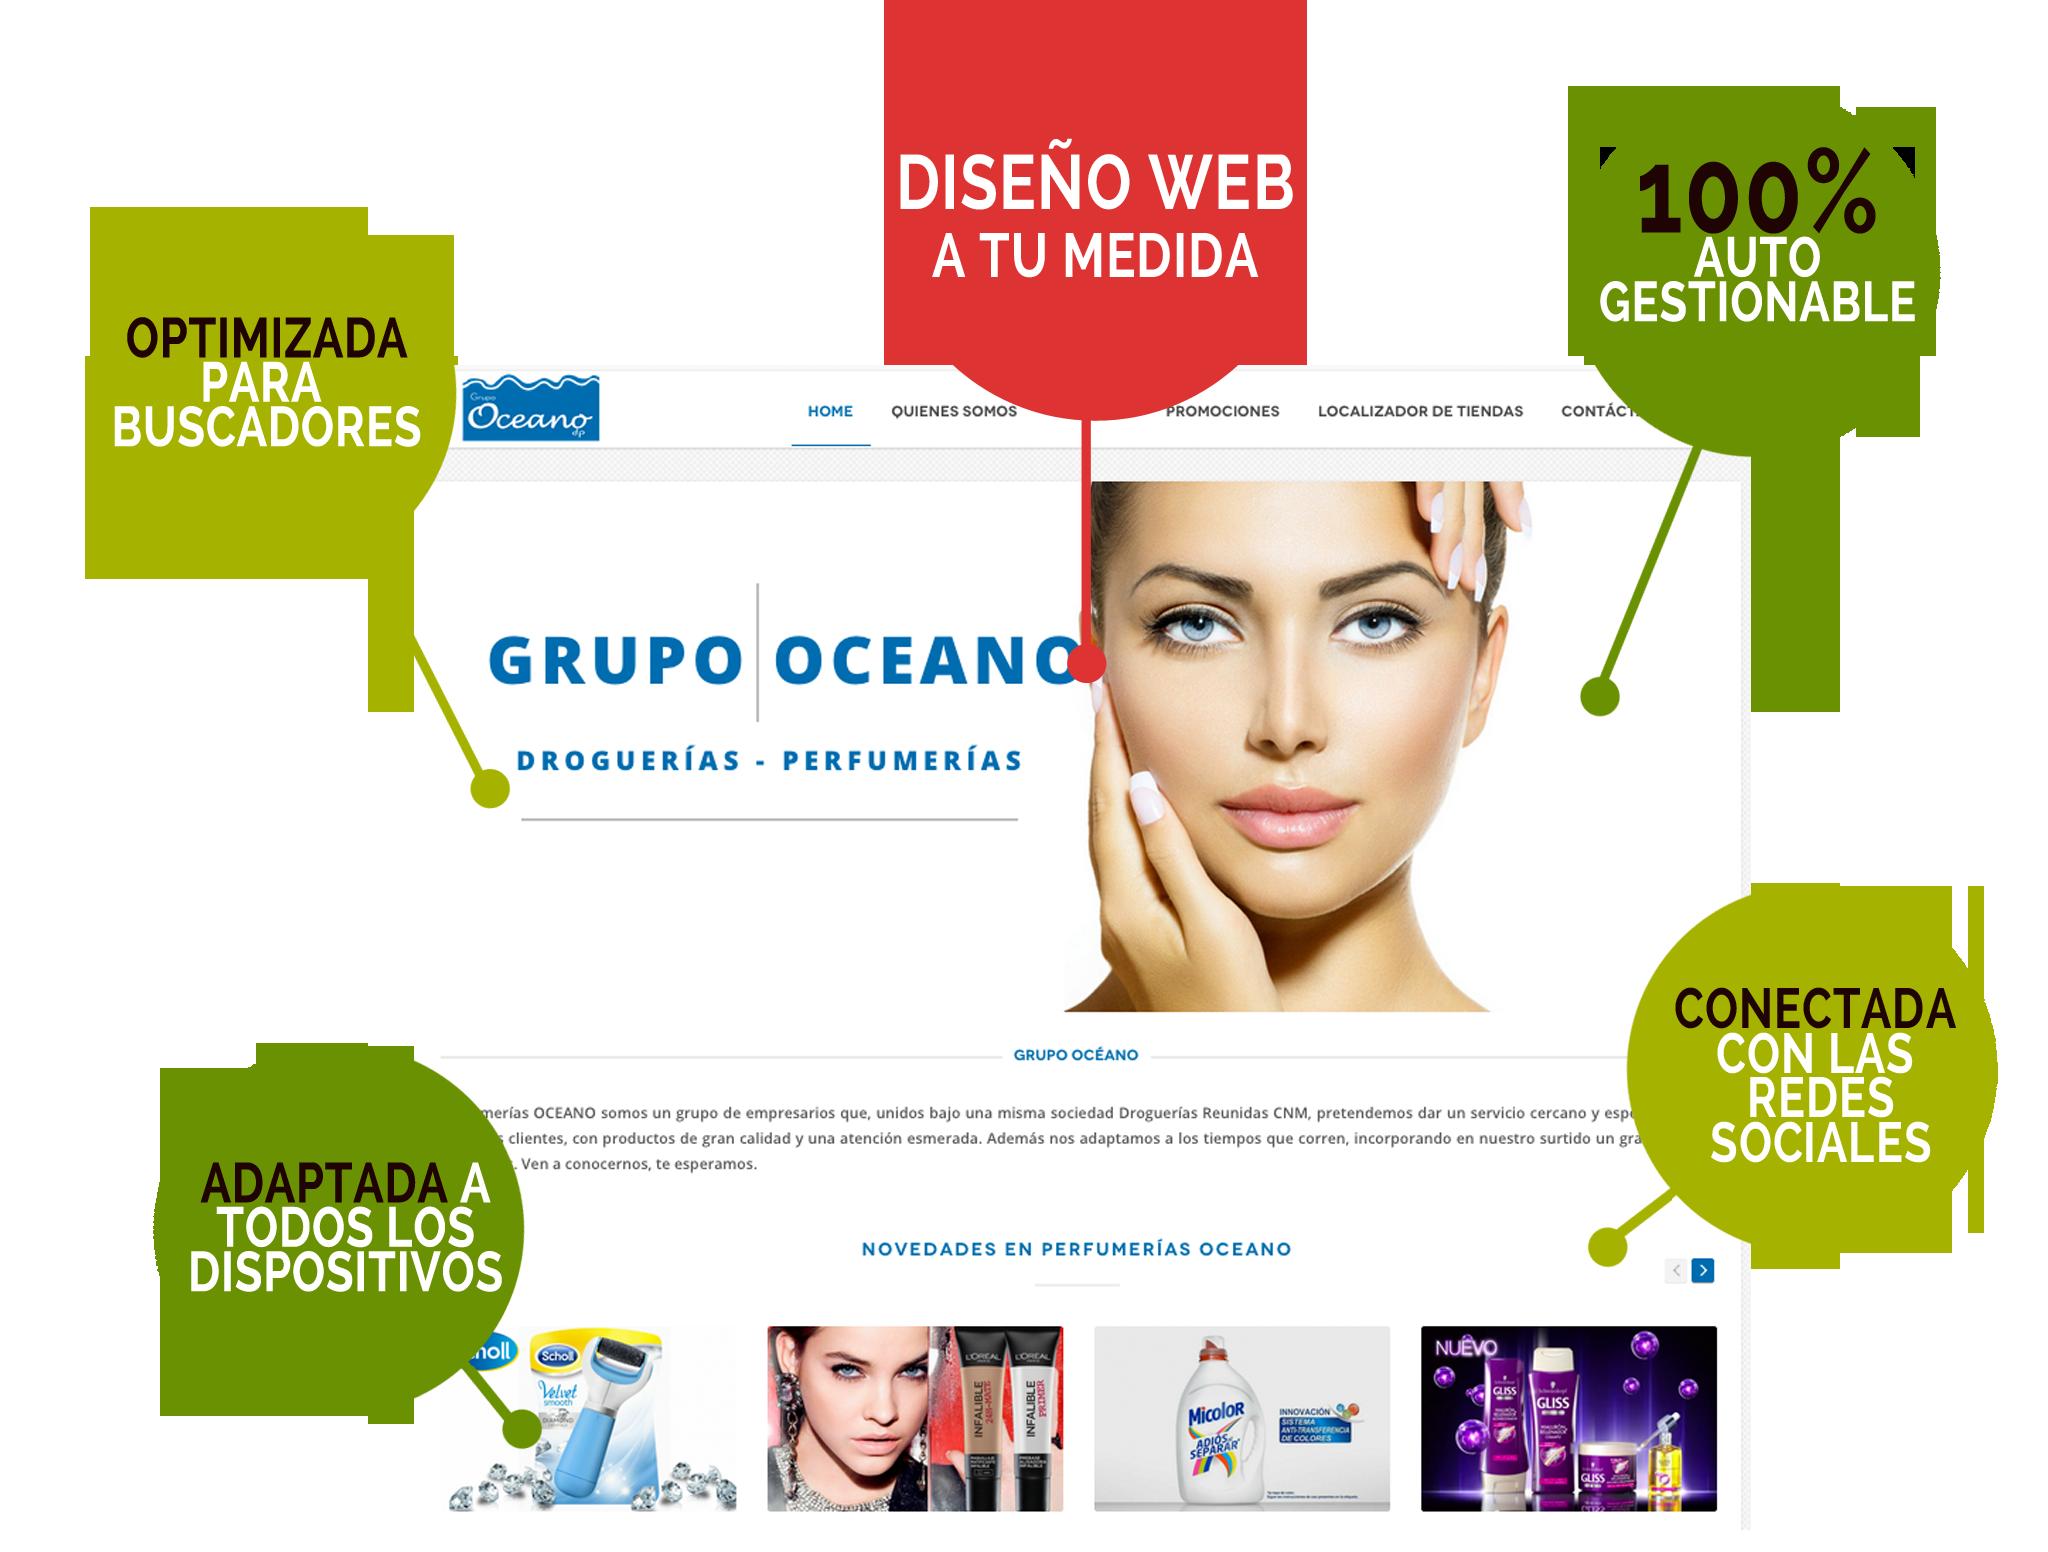 SoftDream ofrecemos Diseño web modular a medida con WordPress o Joomla. Diseño Web Modular, Tienda Online, Blog , Renting Web . Alcorcón